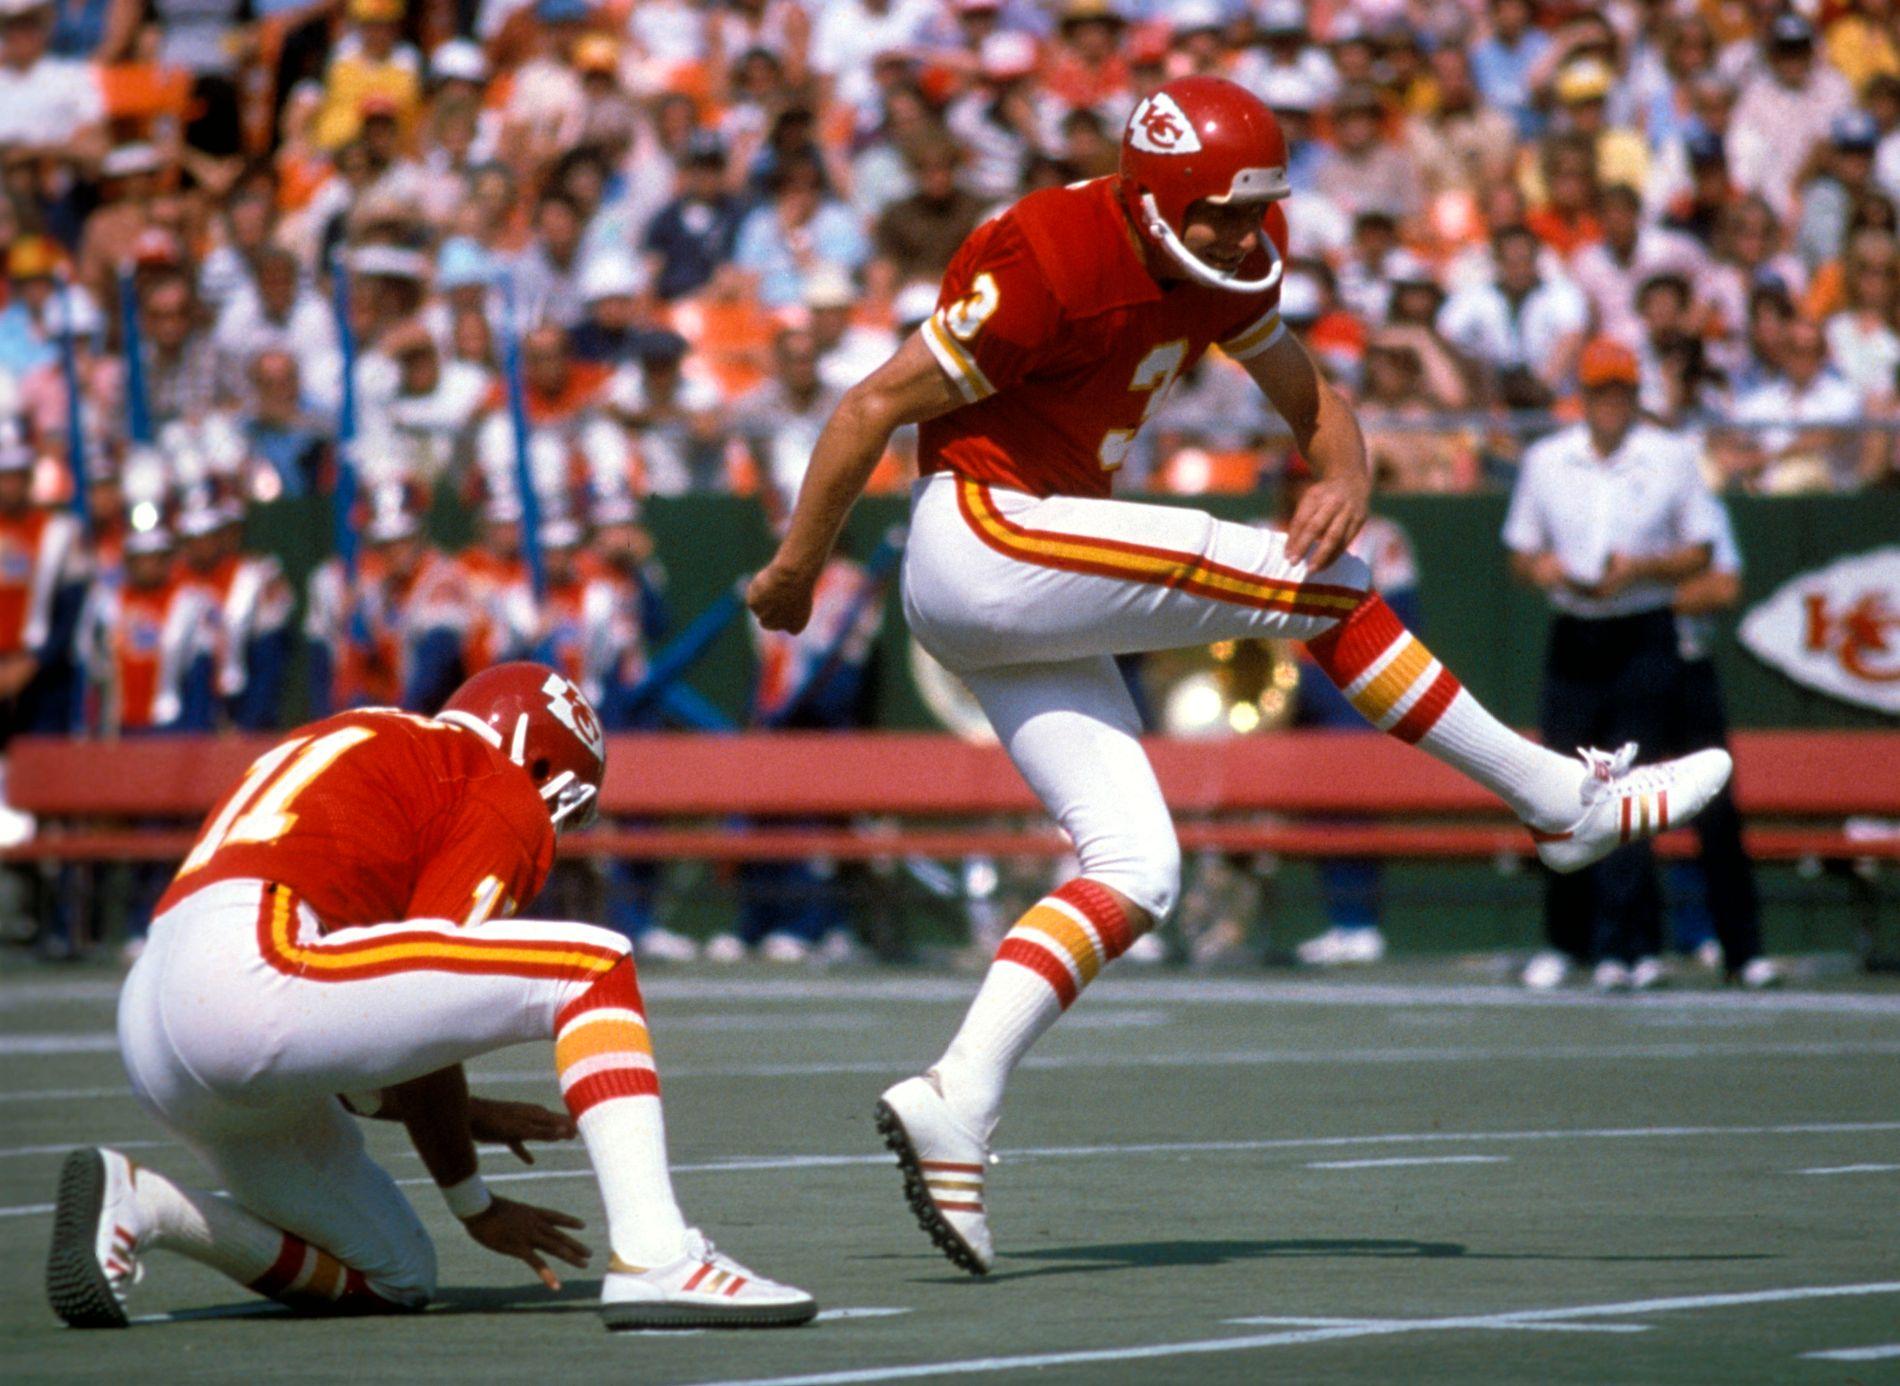 LEGENDE: Jan Stenerud sparket Kansas City Chiefs til Super Bowl-triumf - mot Minnesota Vikings - i 1970.